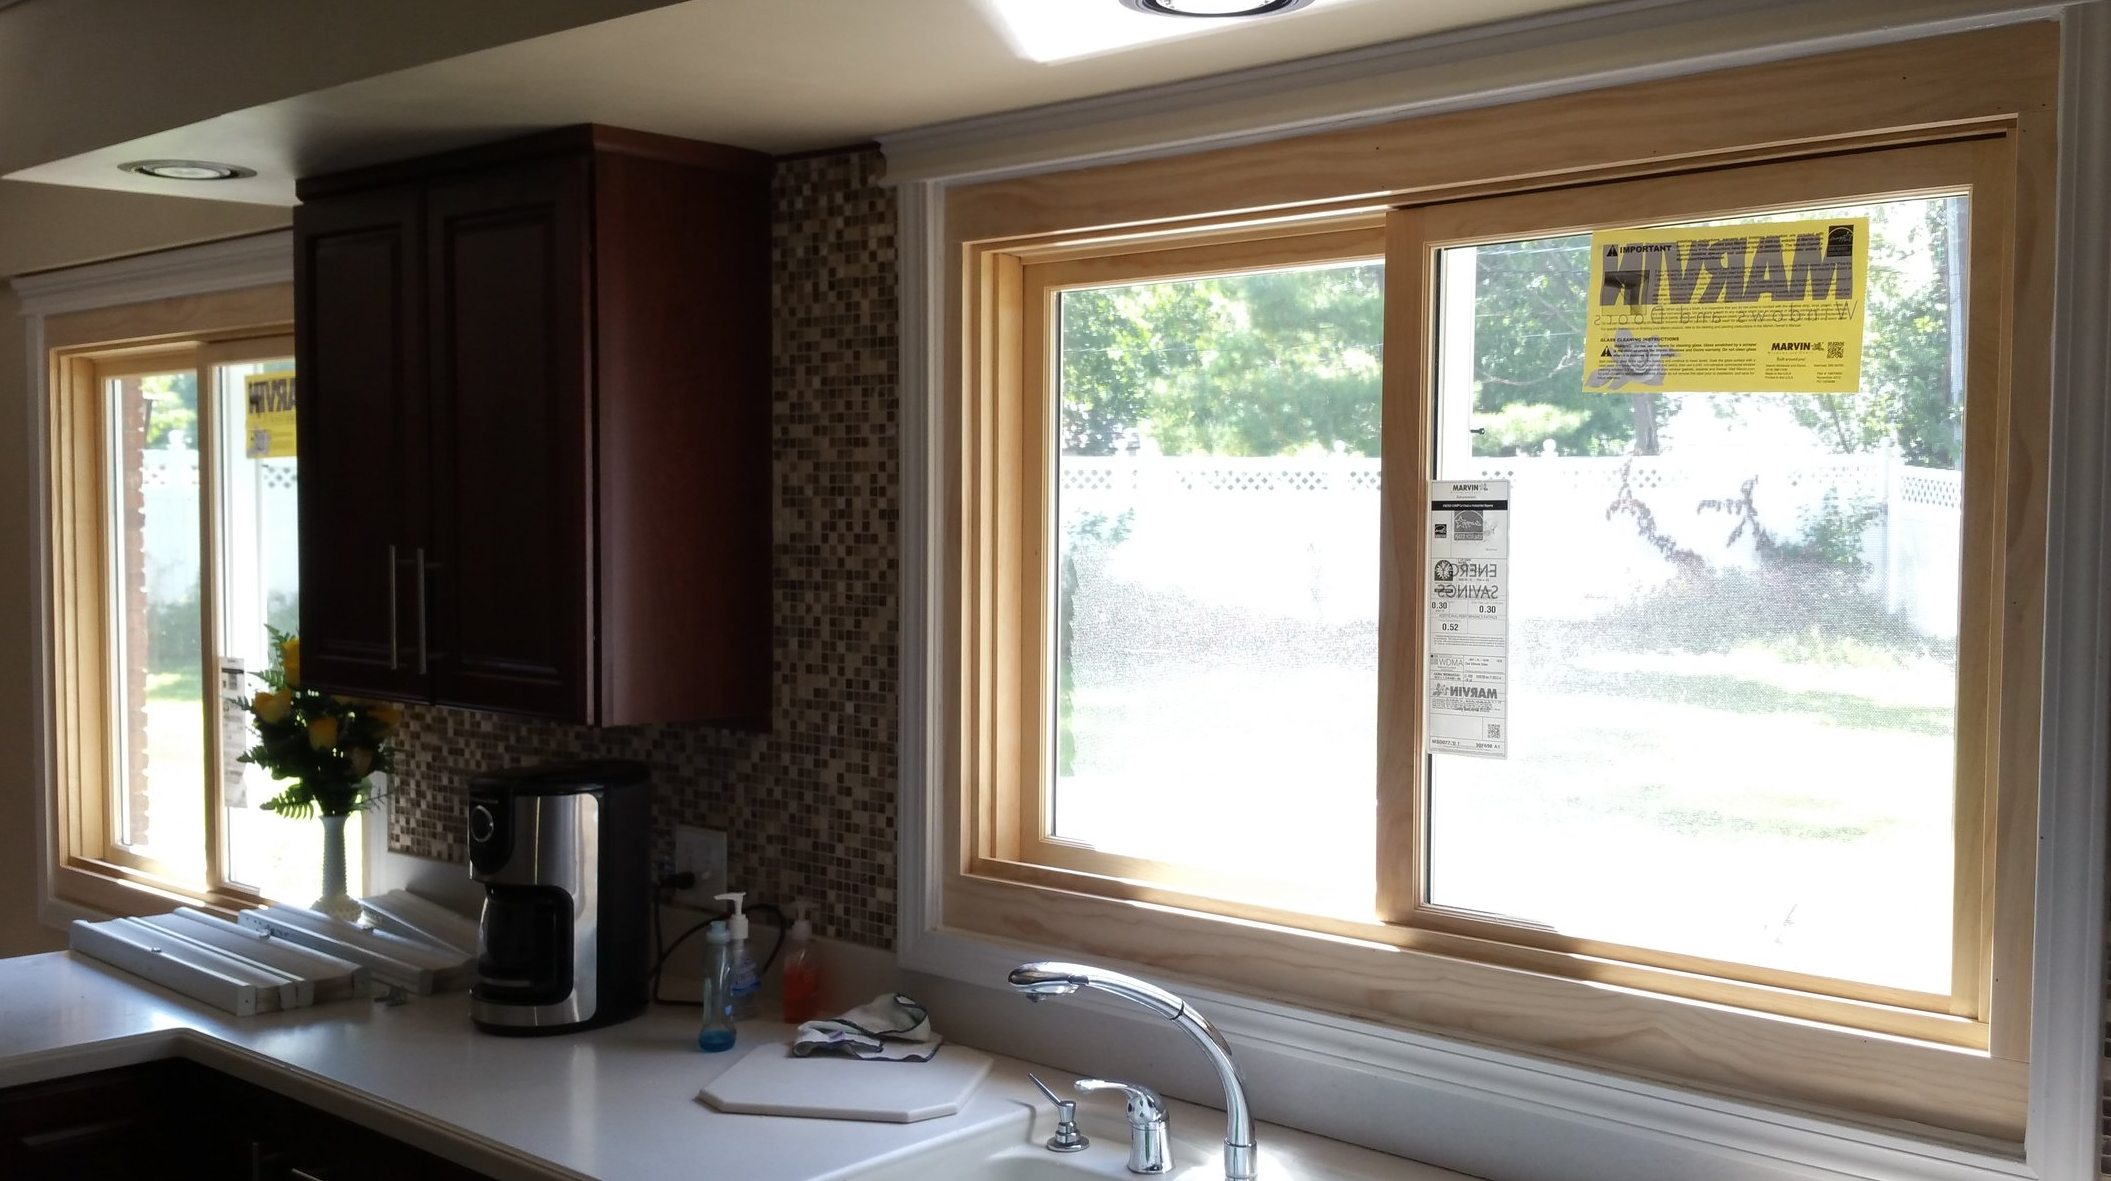 forsthoefel kitchen #8.jpg